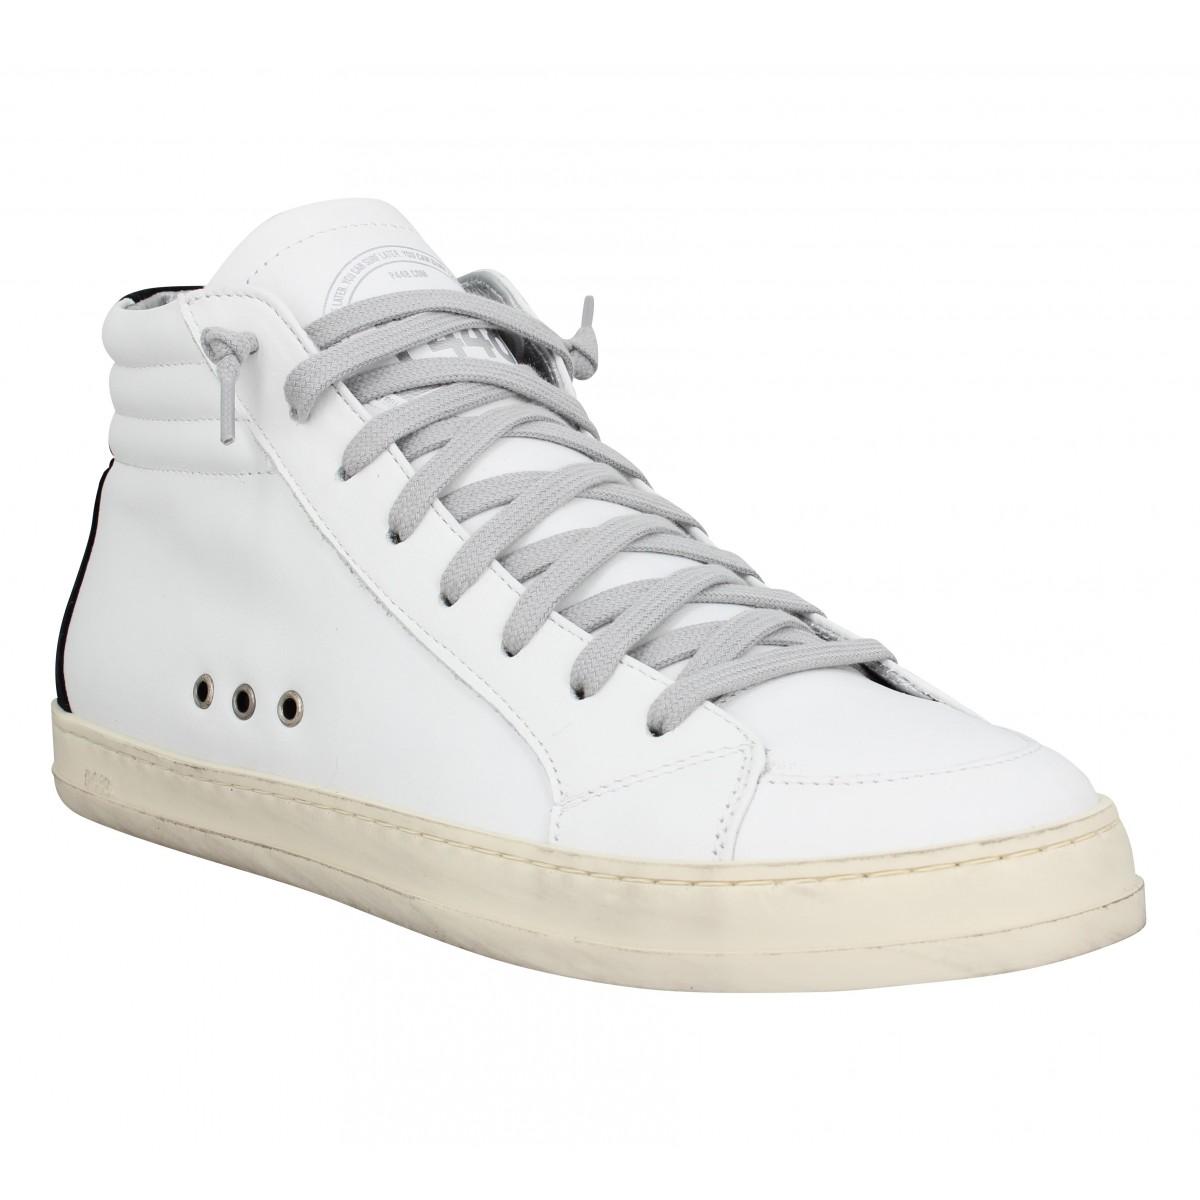 Baskets P448 Skate cuir velours Homme White Black